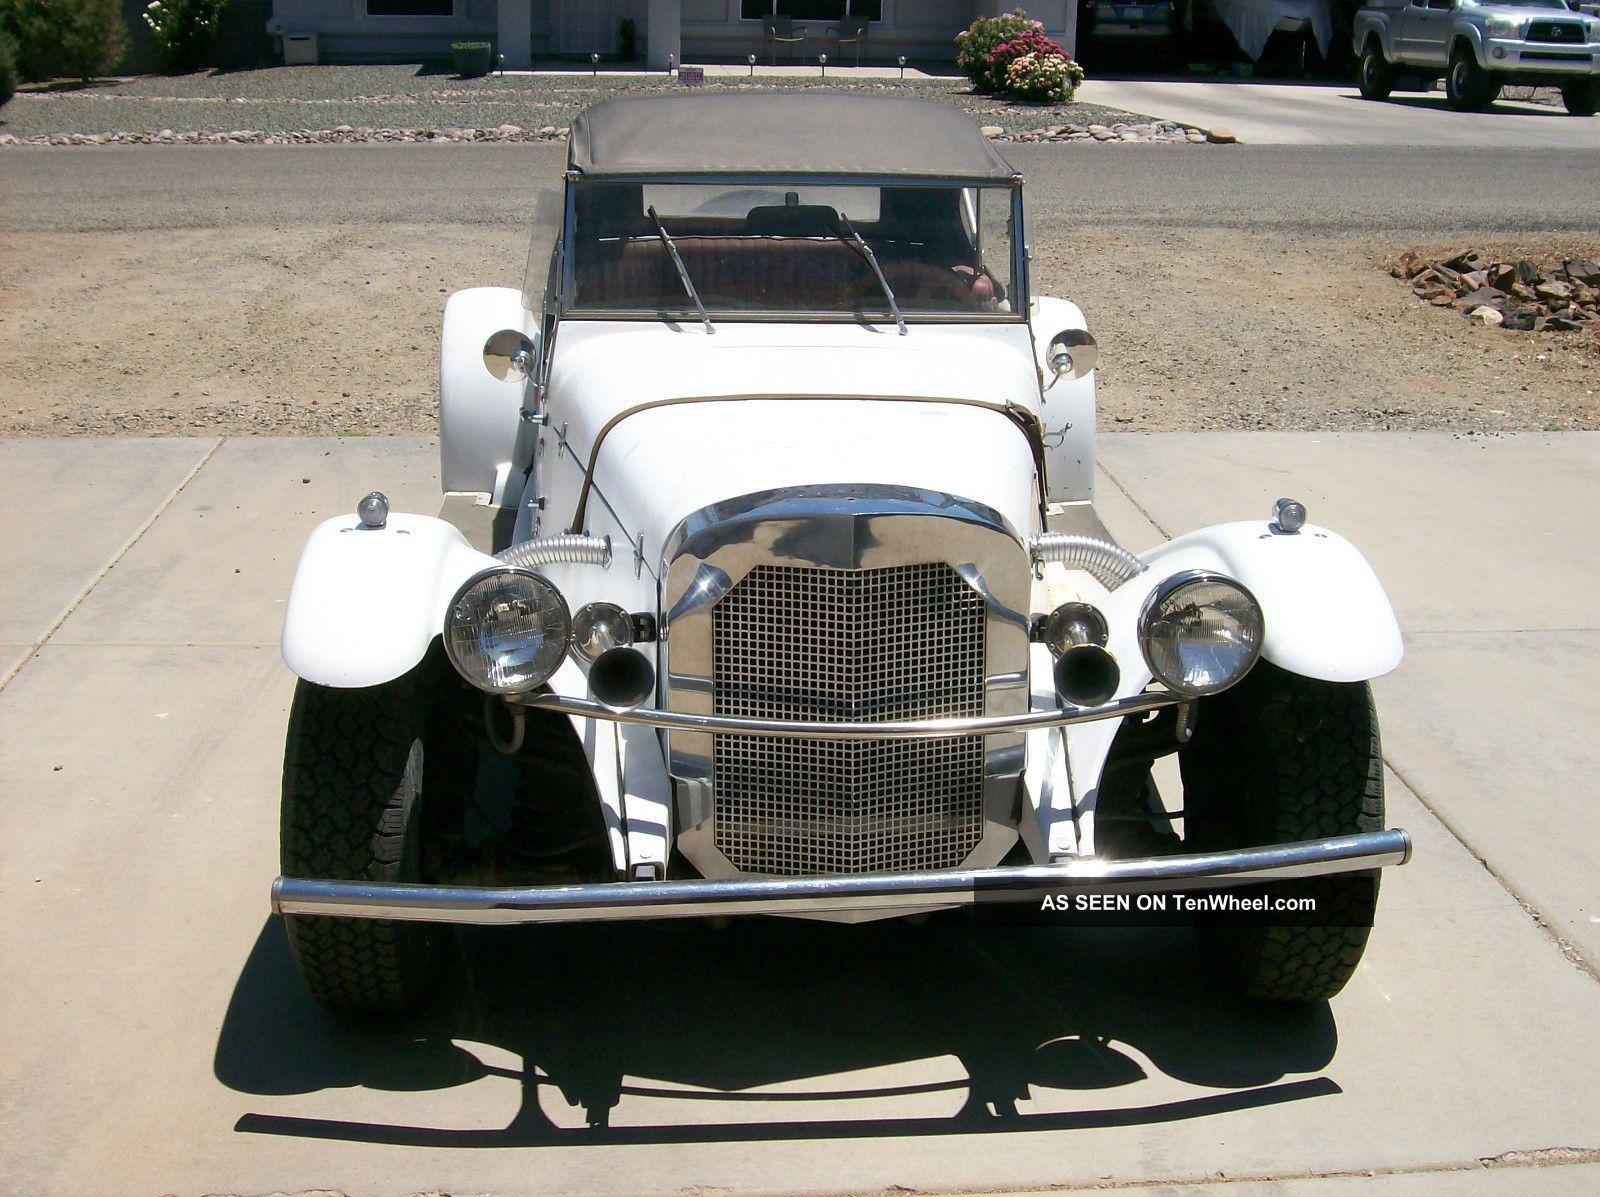 1981 Gazelle Kit Car Replica Of 1929 Mercedes Replica/Kit Makes photo